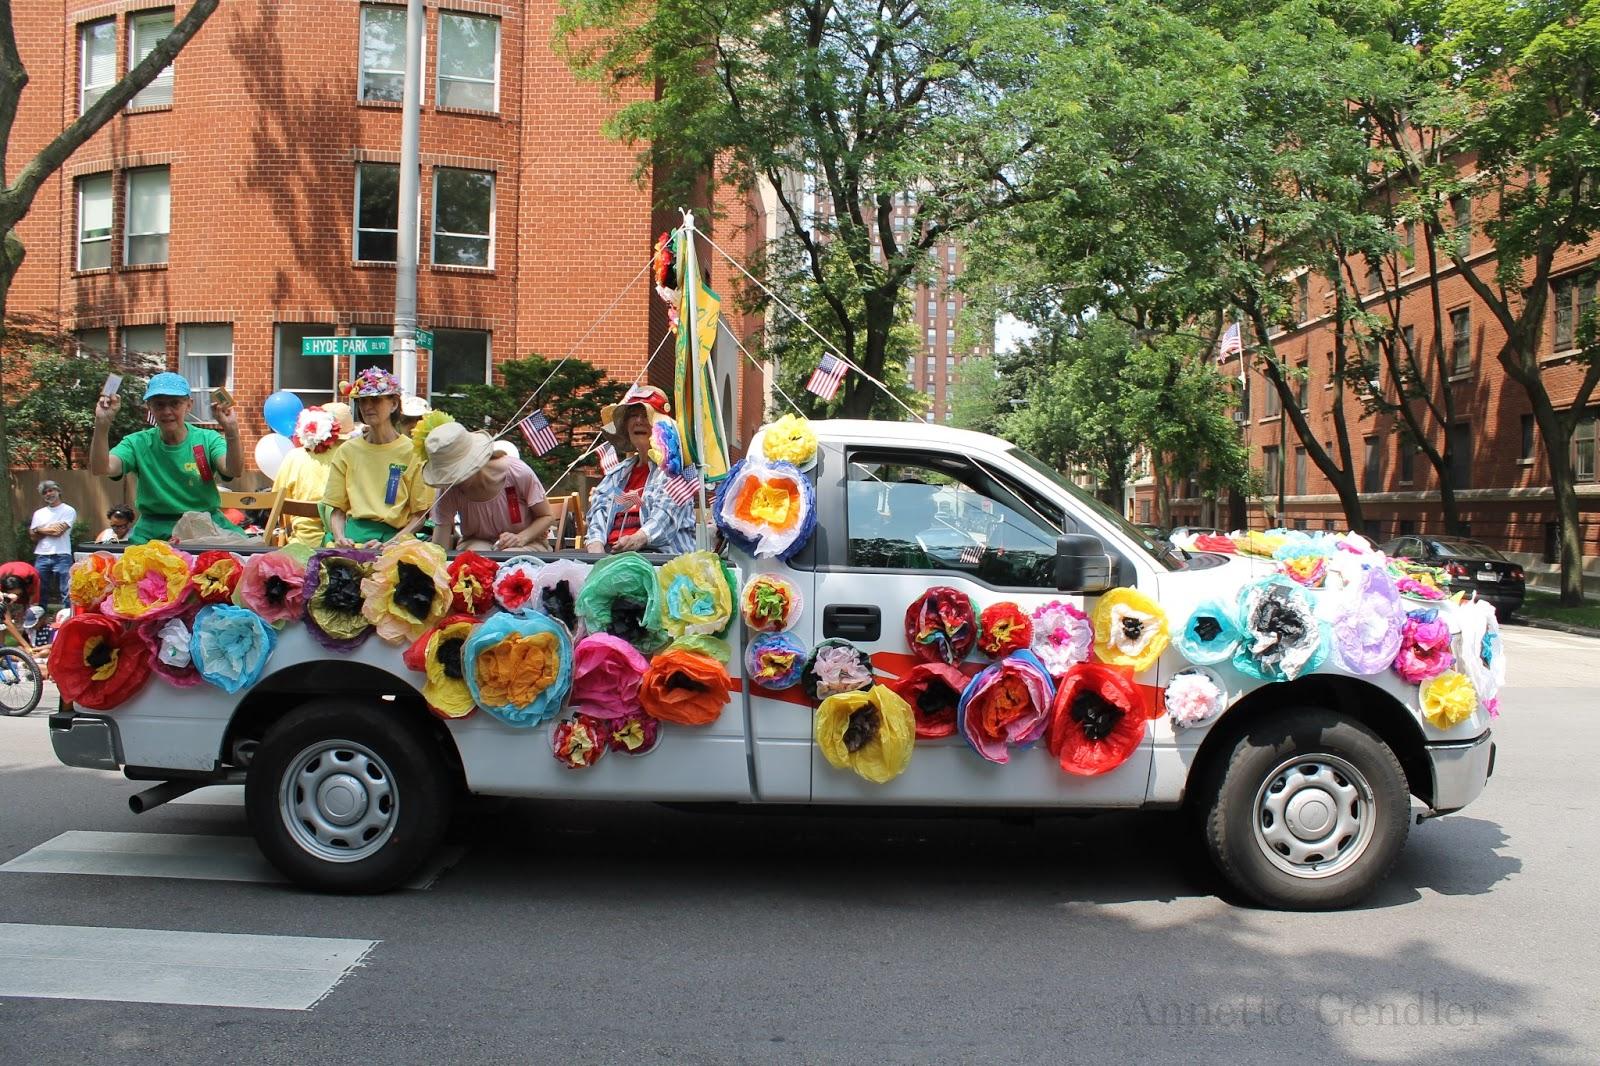 Disney Cars Bedroom Ideas Car Decorations For Parade